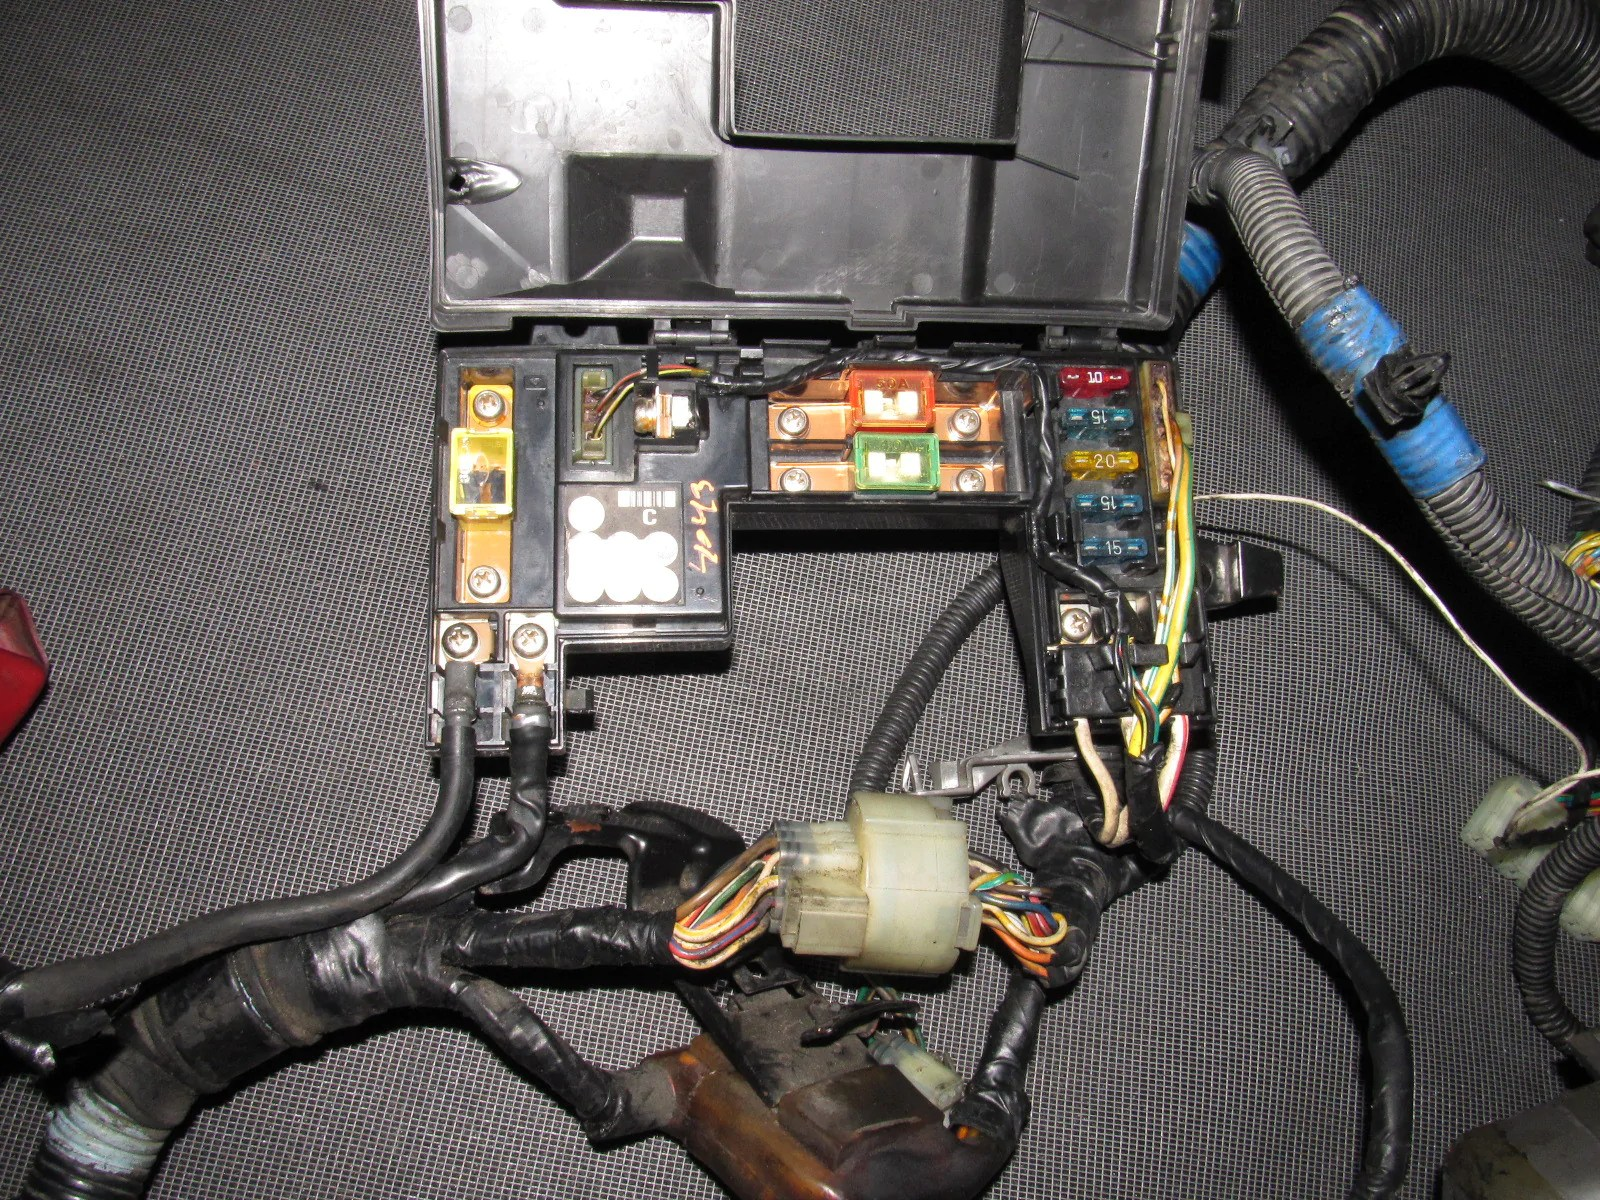 small resolution of 88 89 honda crx oem d15b2 engine wiring harness autopartone com eclipse wiring harness honda crx wiring harness